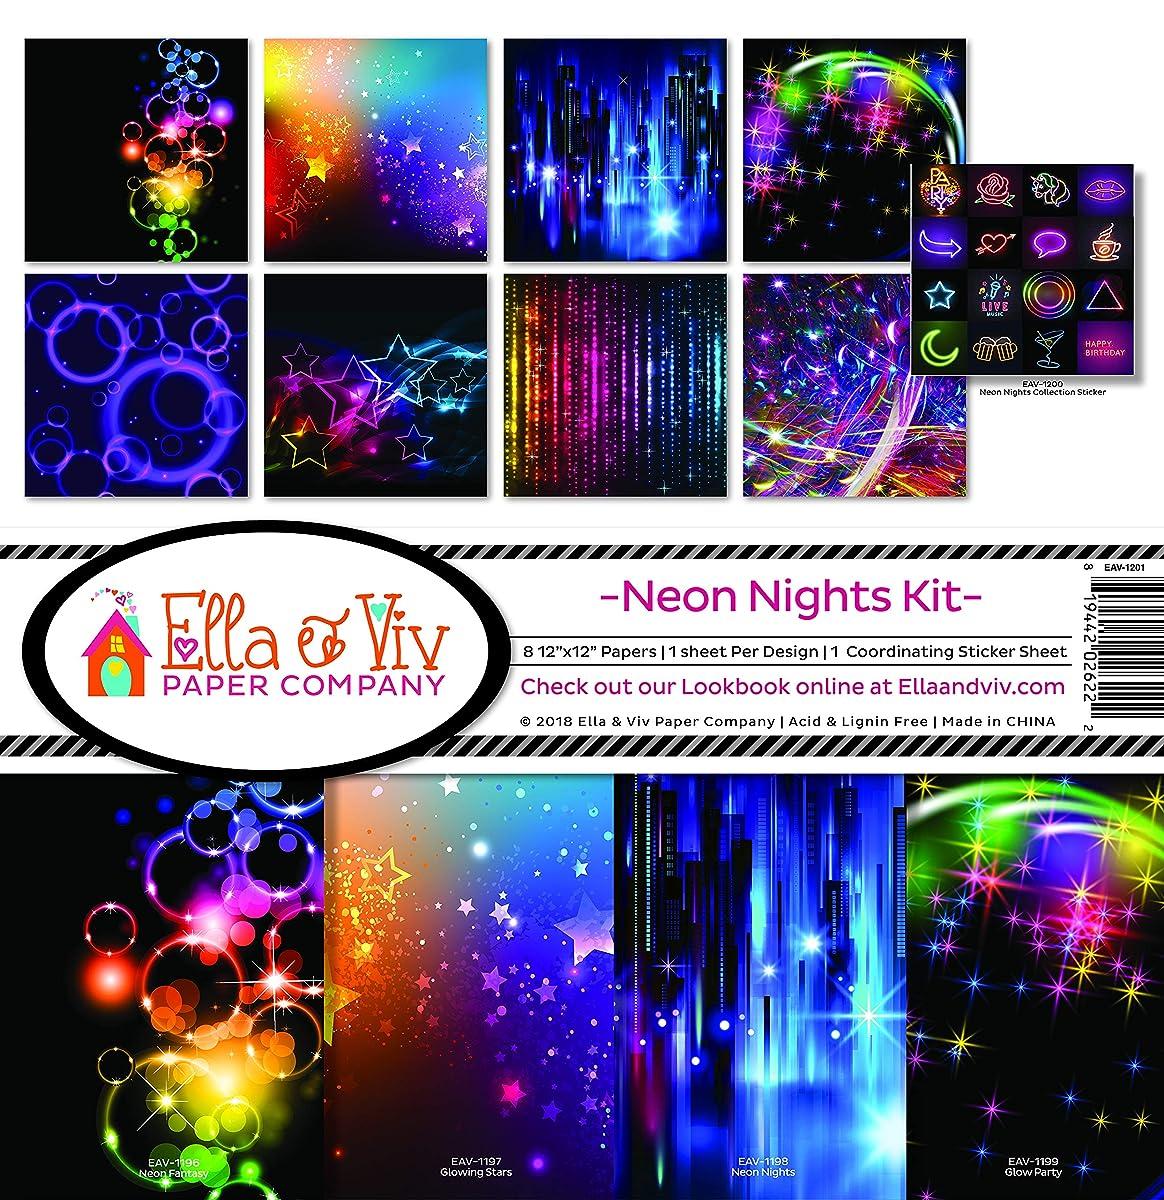 Ella & Viv by Reminisce EAV-1201 Neon Nights Scrapbook Collection Kit, Multi Color Palette